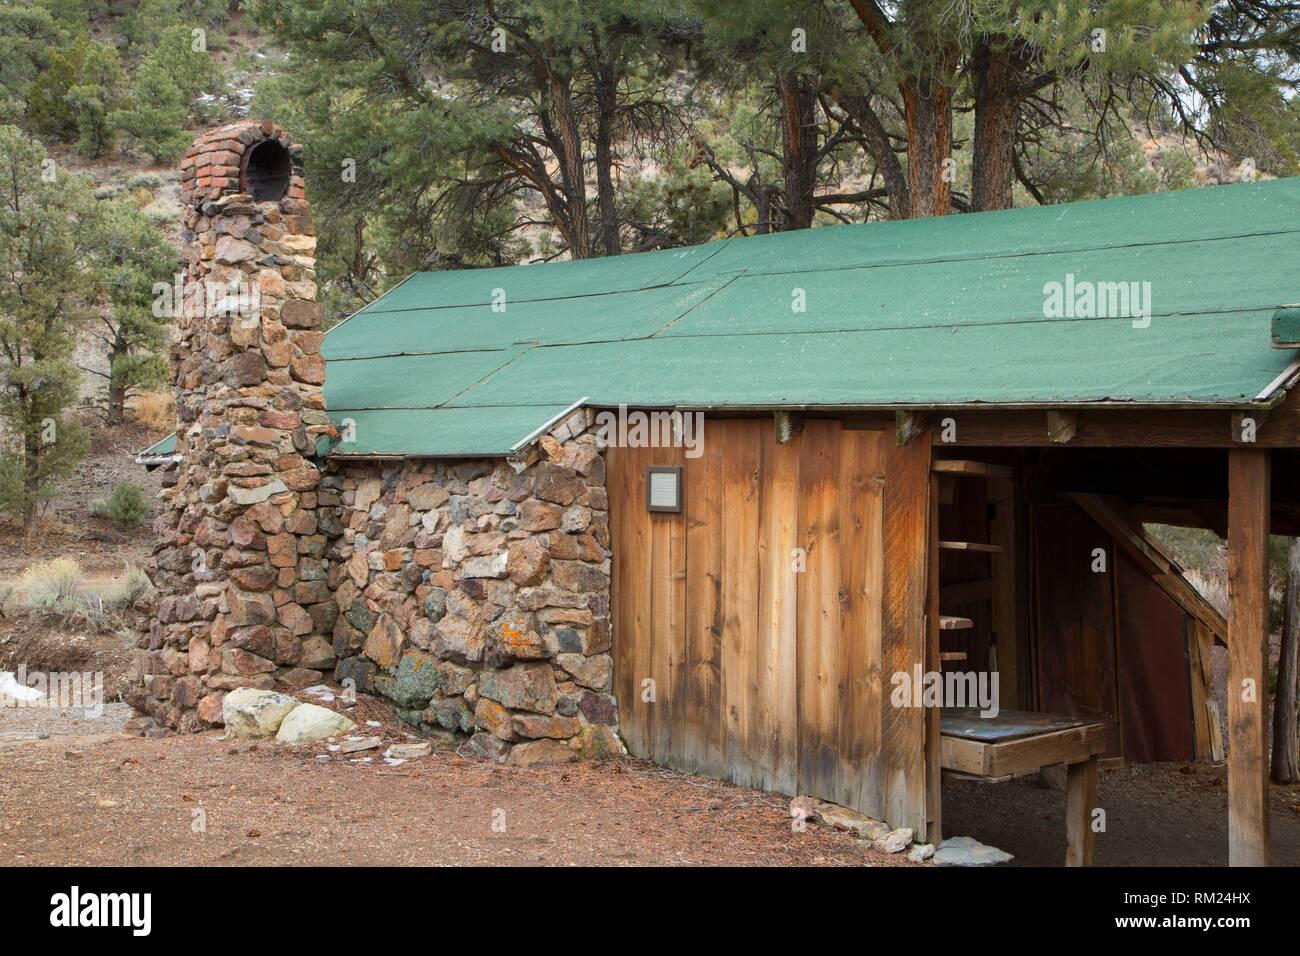 Dr. Camp's Cabin, Berlin-Icthyosaur State Park, Nevada. - Stock Image